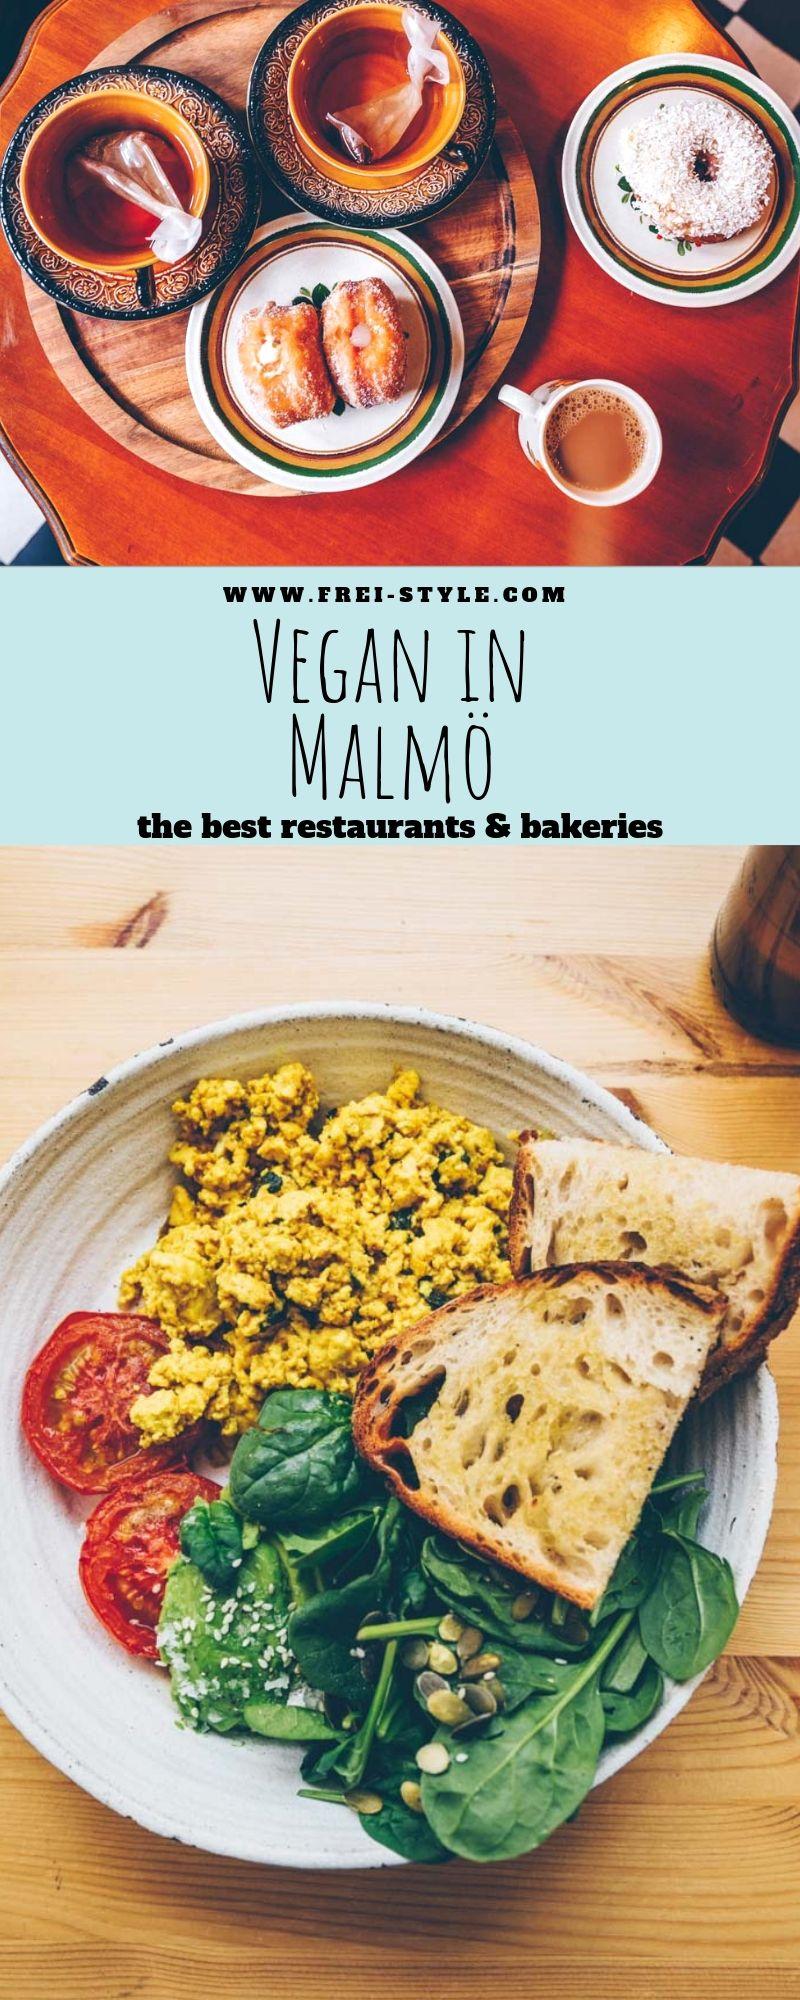 Vegan in Malmö